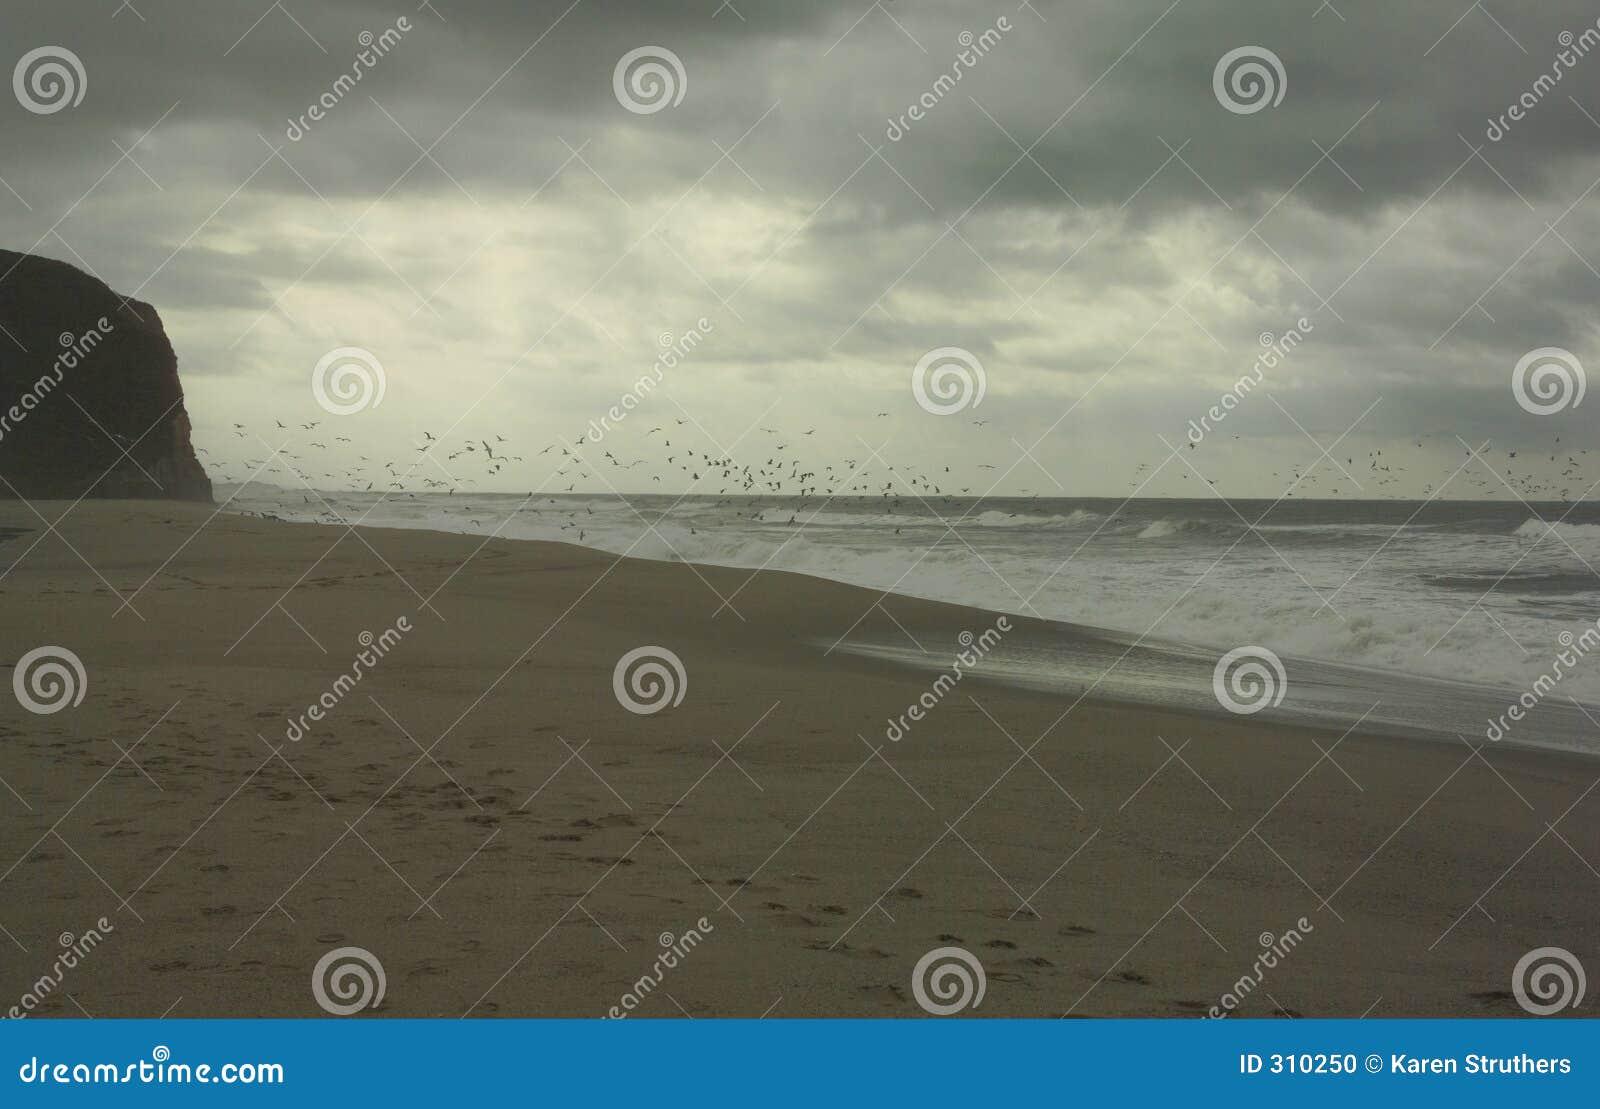 Ptaka lot nad morzem